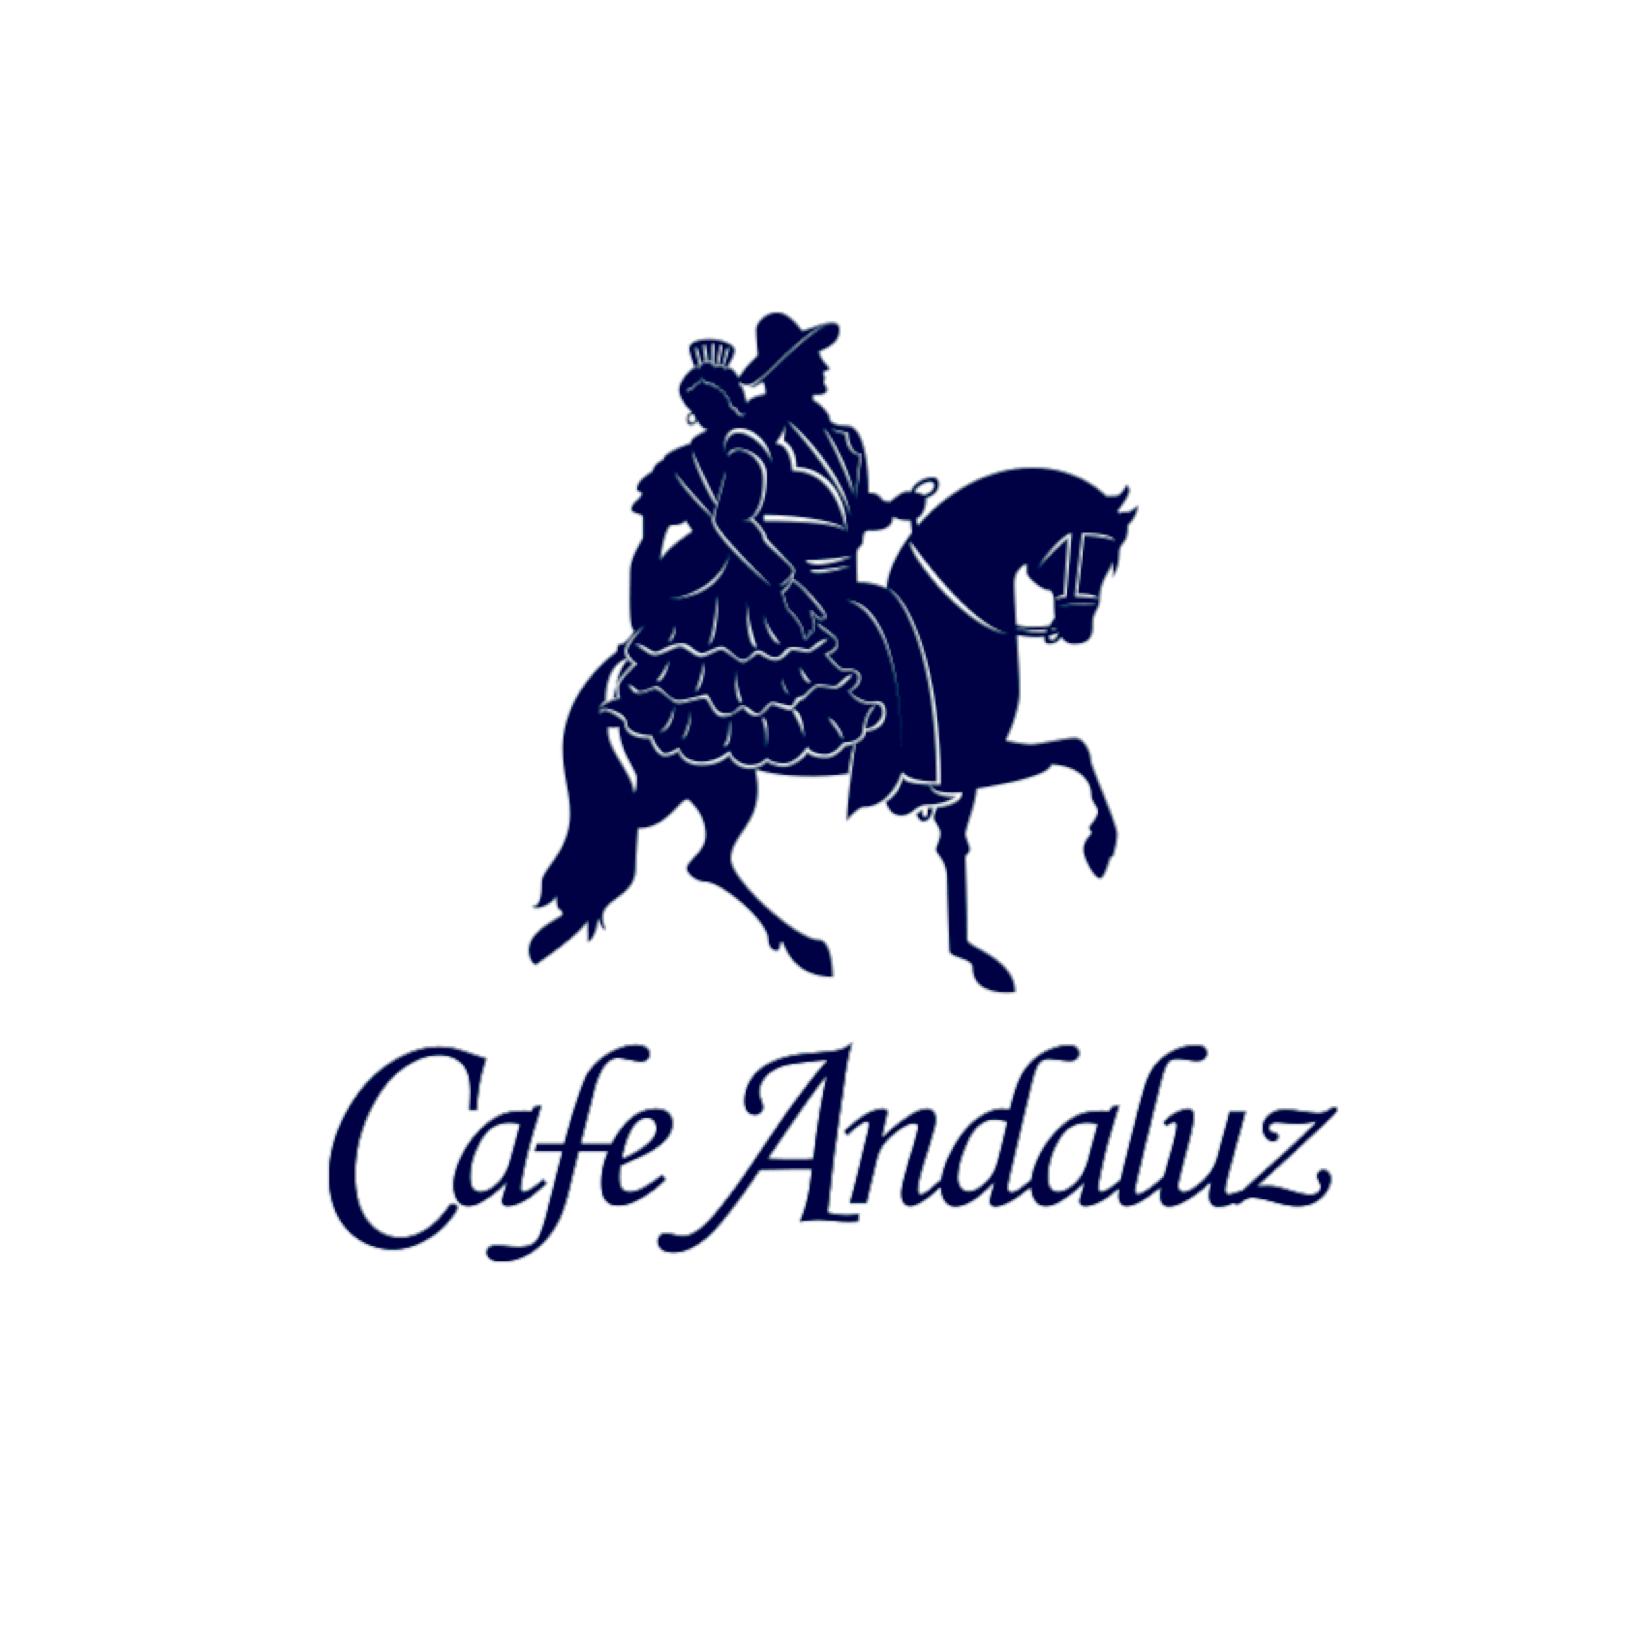 Cafe Andaluz